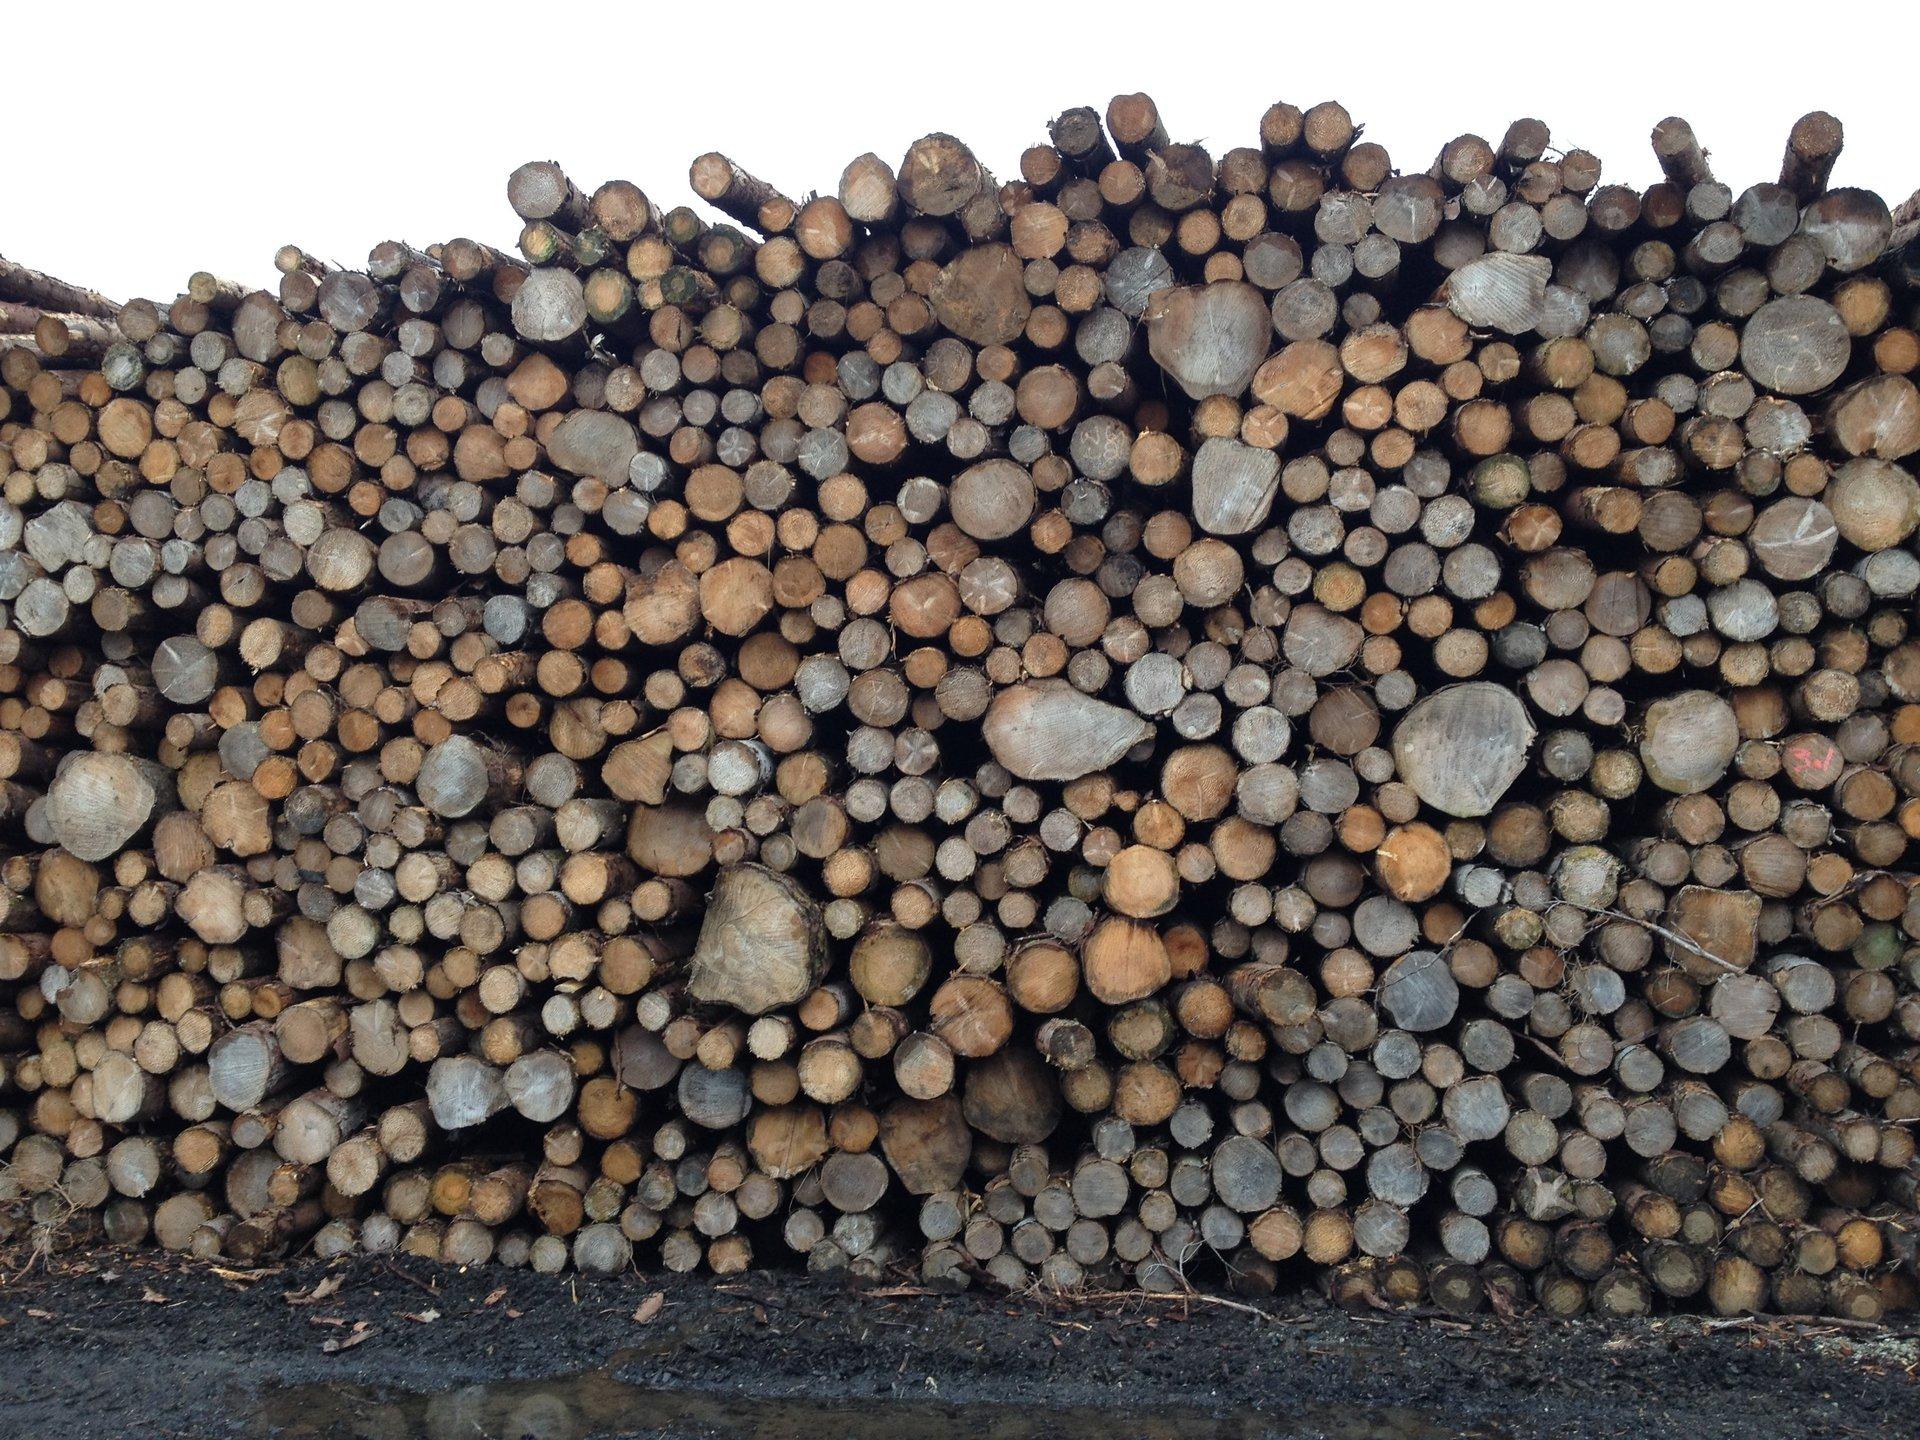 Firewood stock